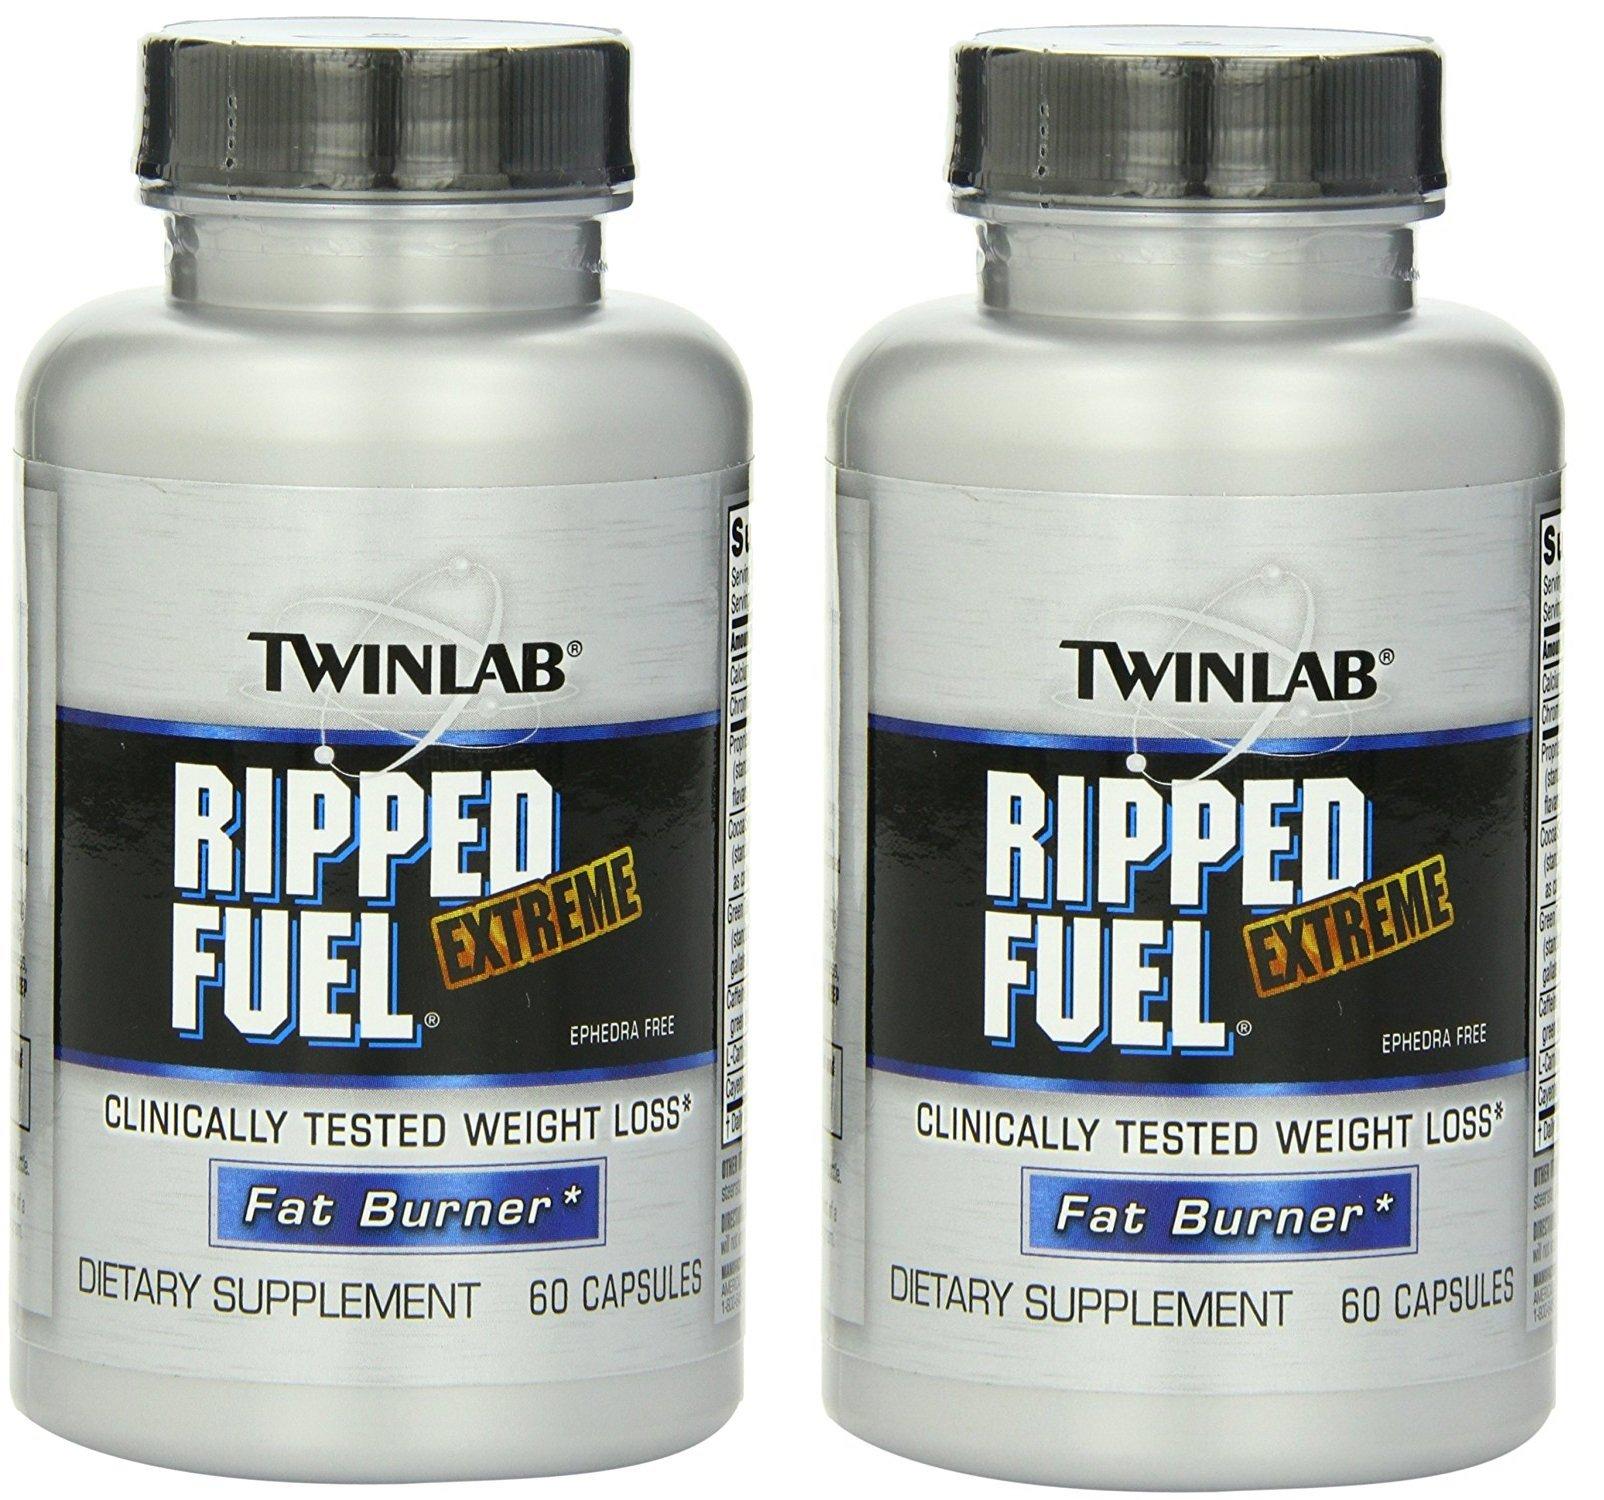 Ripped Fuel Extreme - Fat Burner (Extreme Ephedra Free 60 x 2)